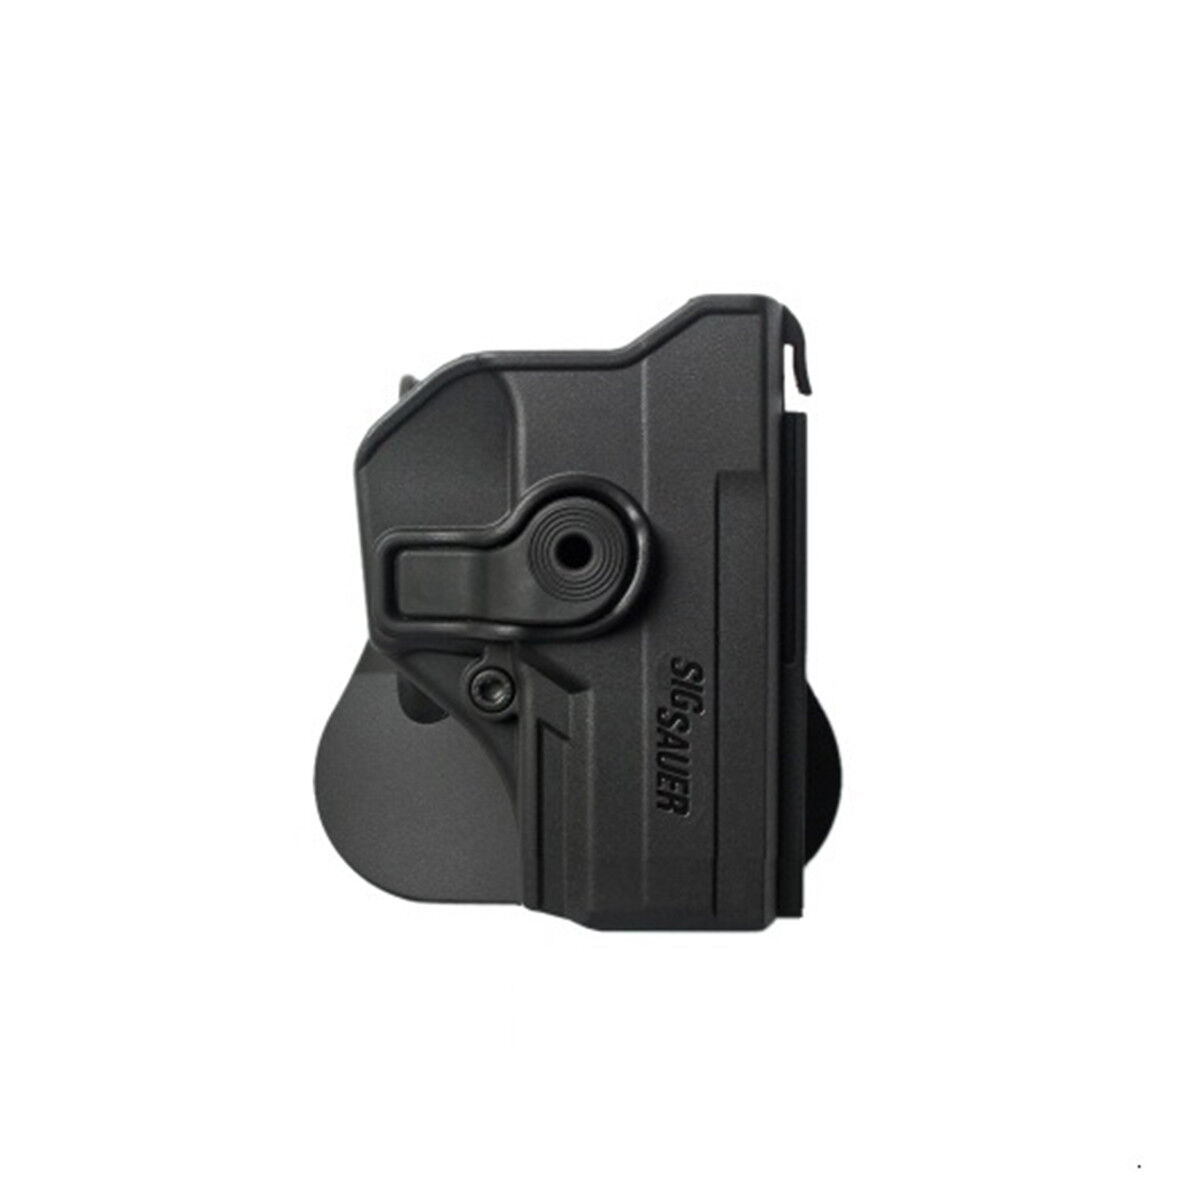 IMI Defense Sig Sauer P250 P320 (Compact) Retention Holster -Z1060- C